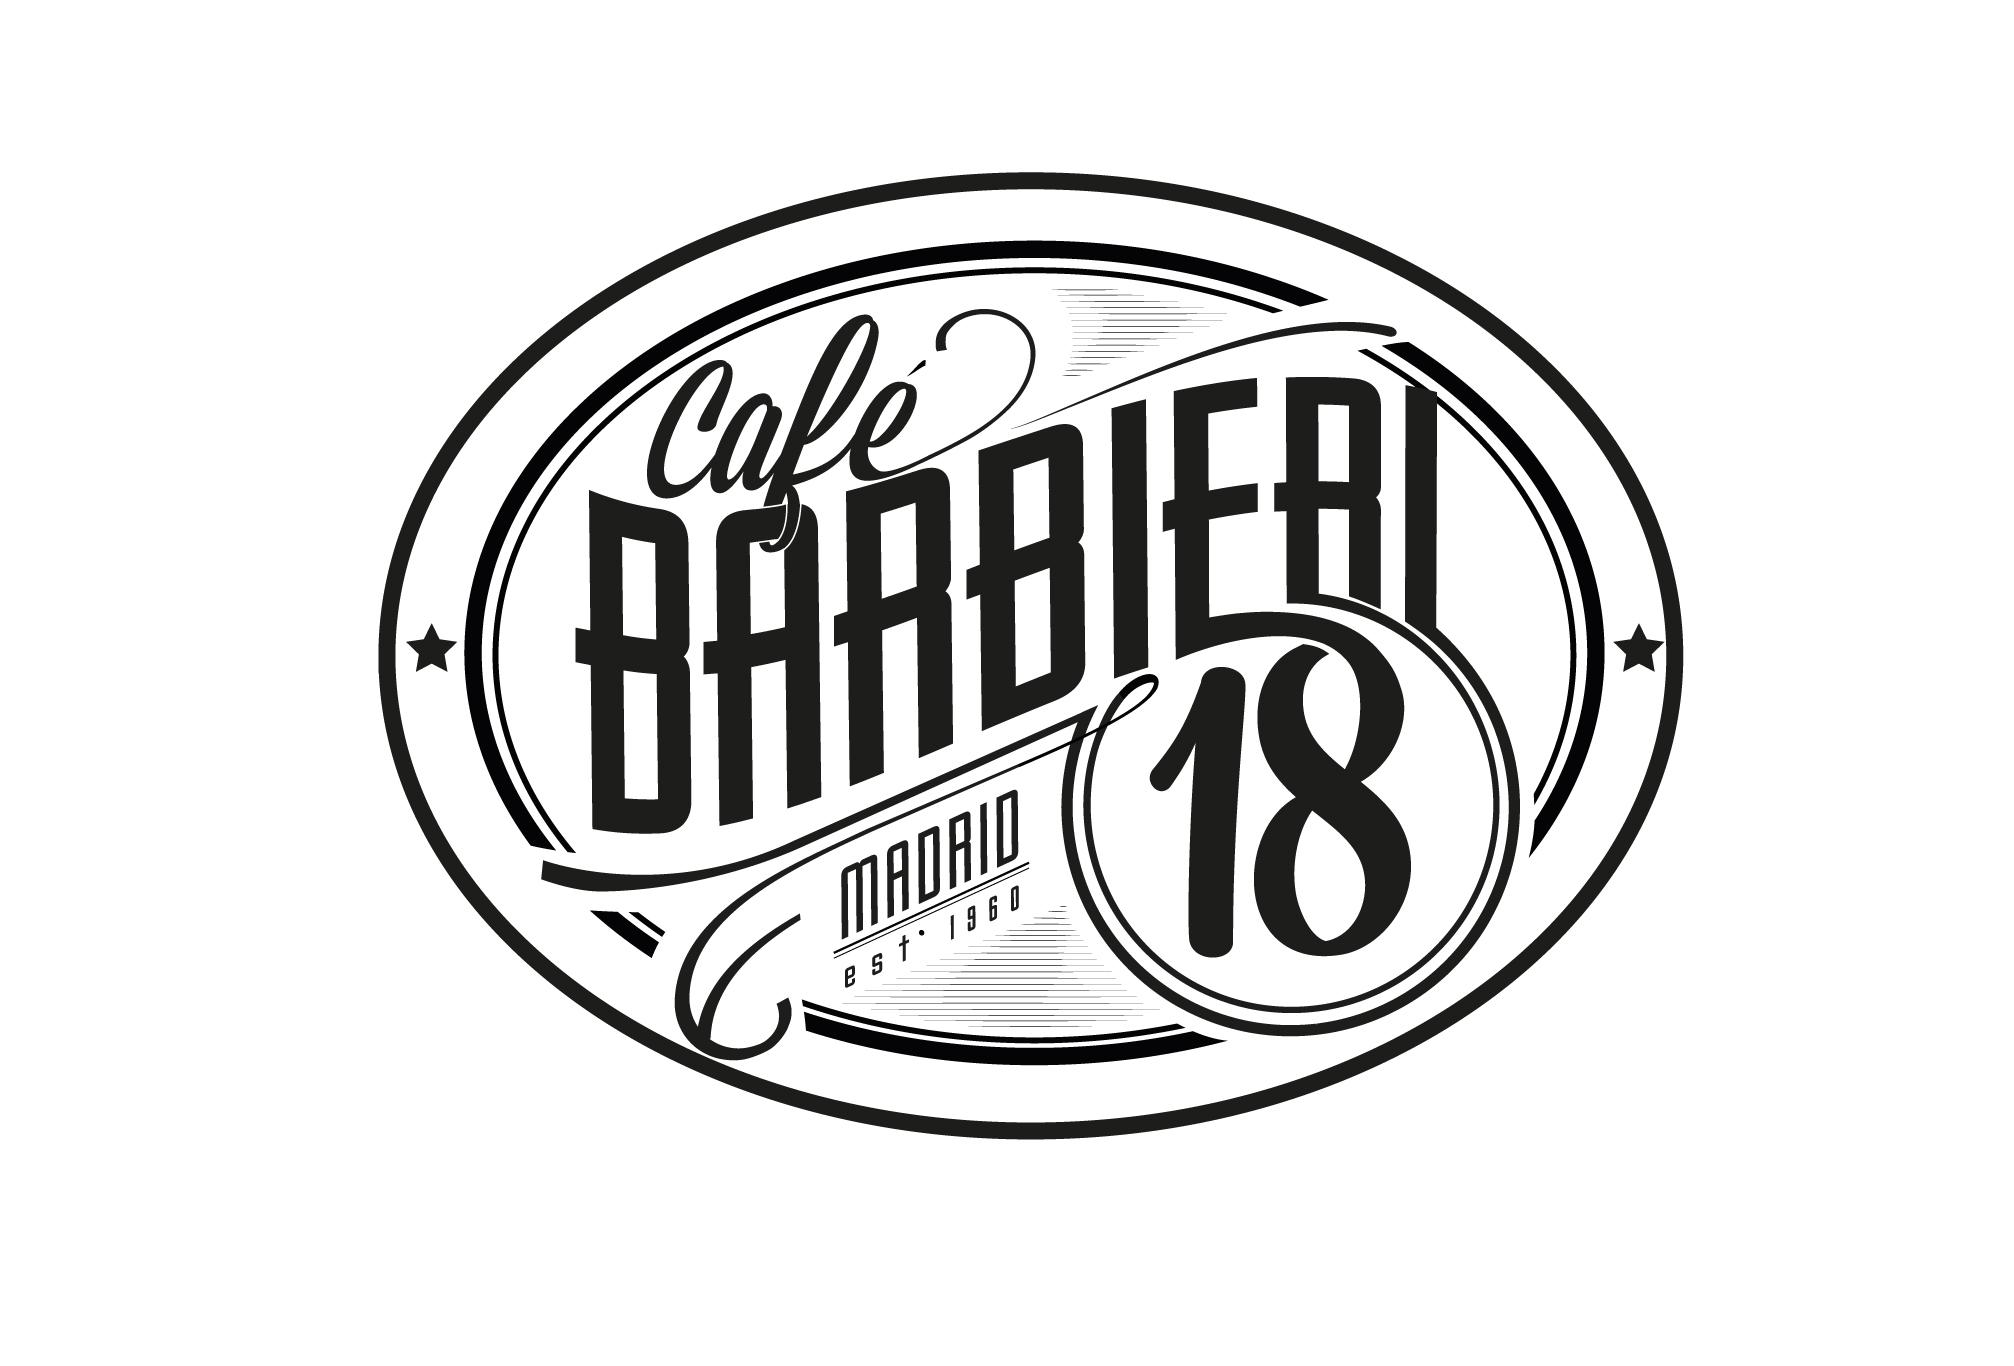 BARBIERI 18 - image 3 - student project